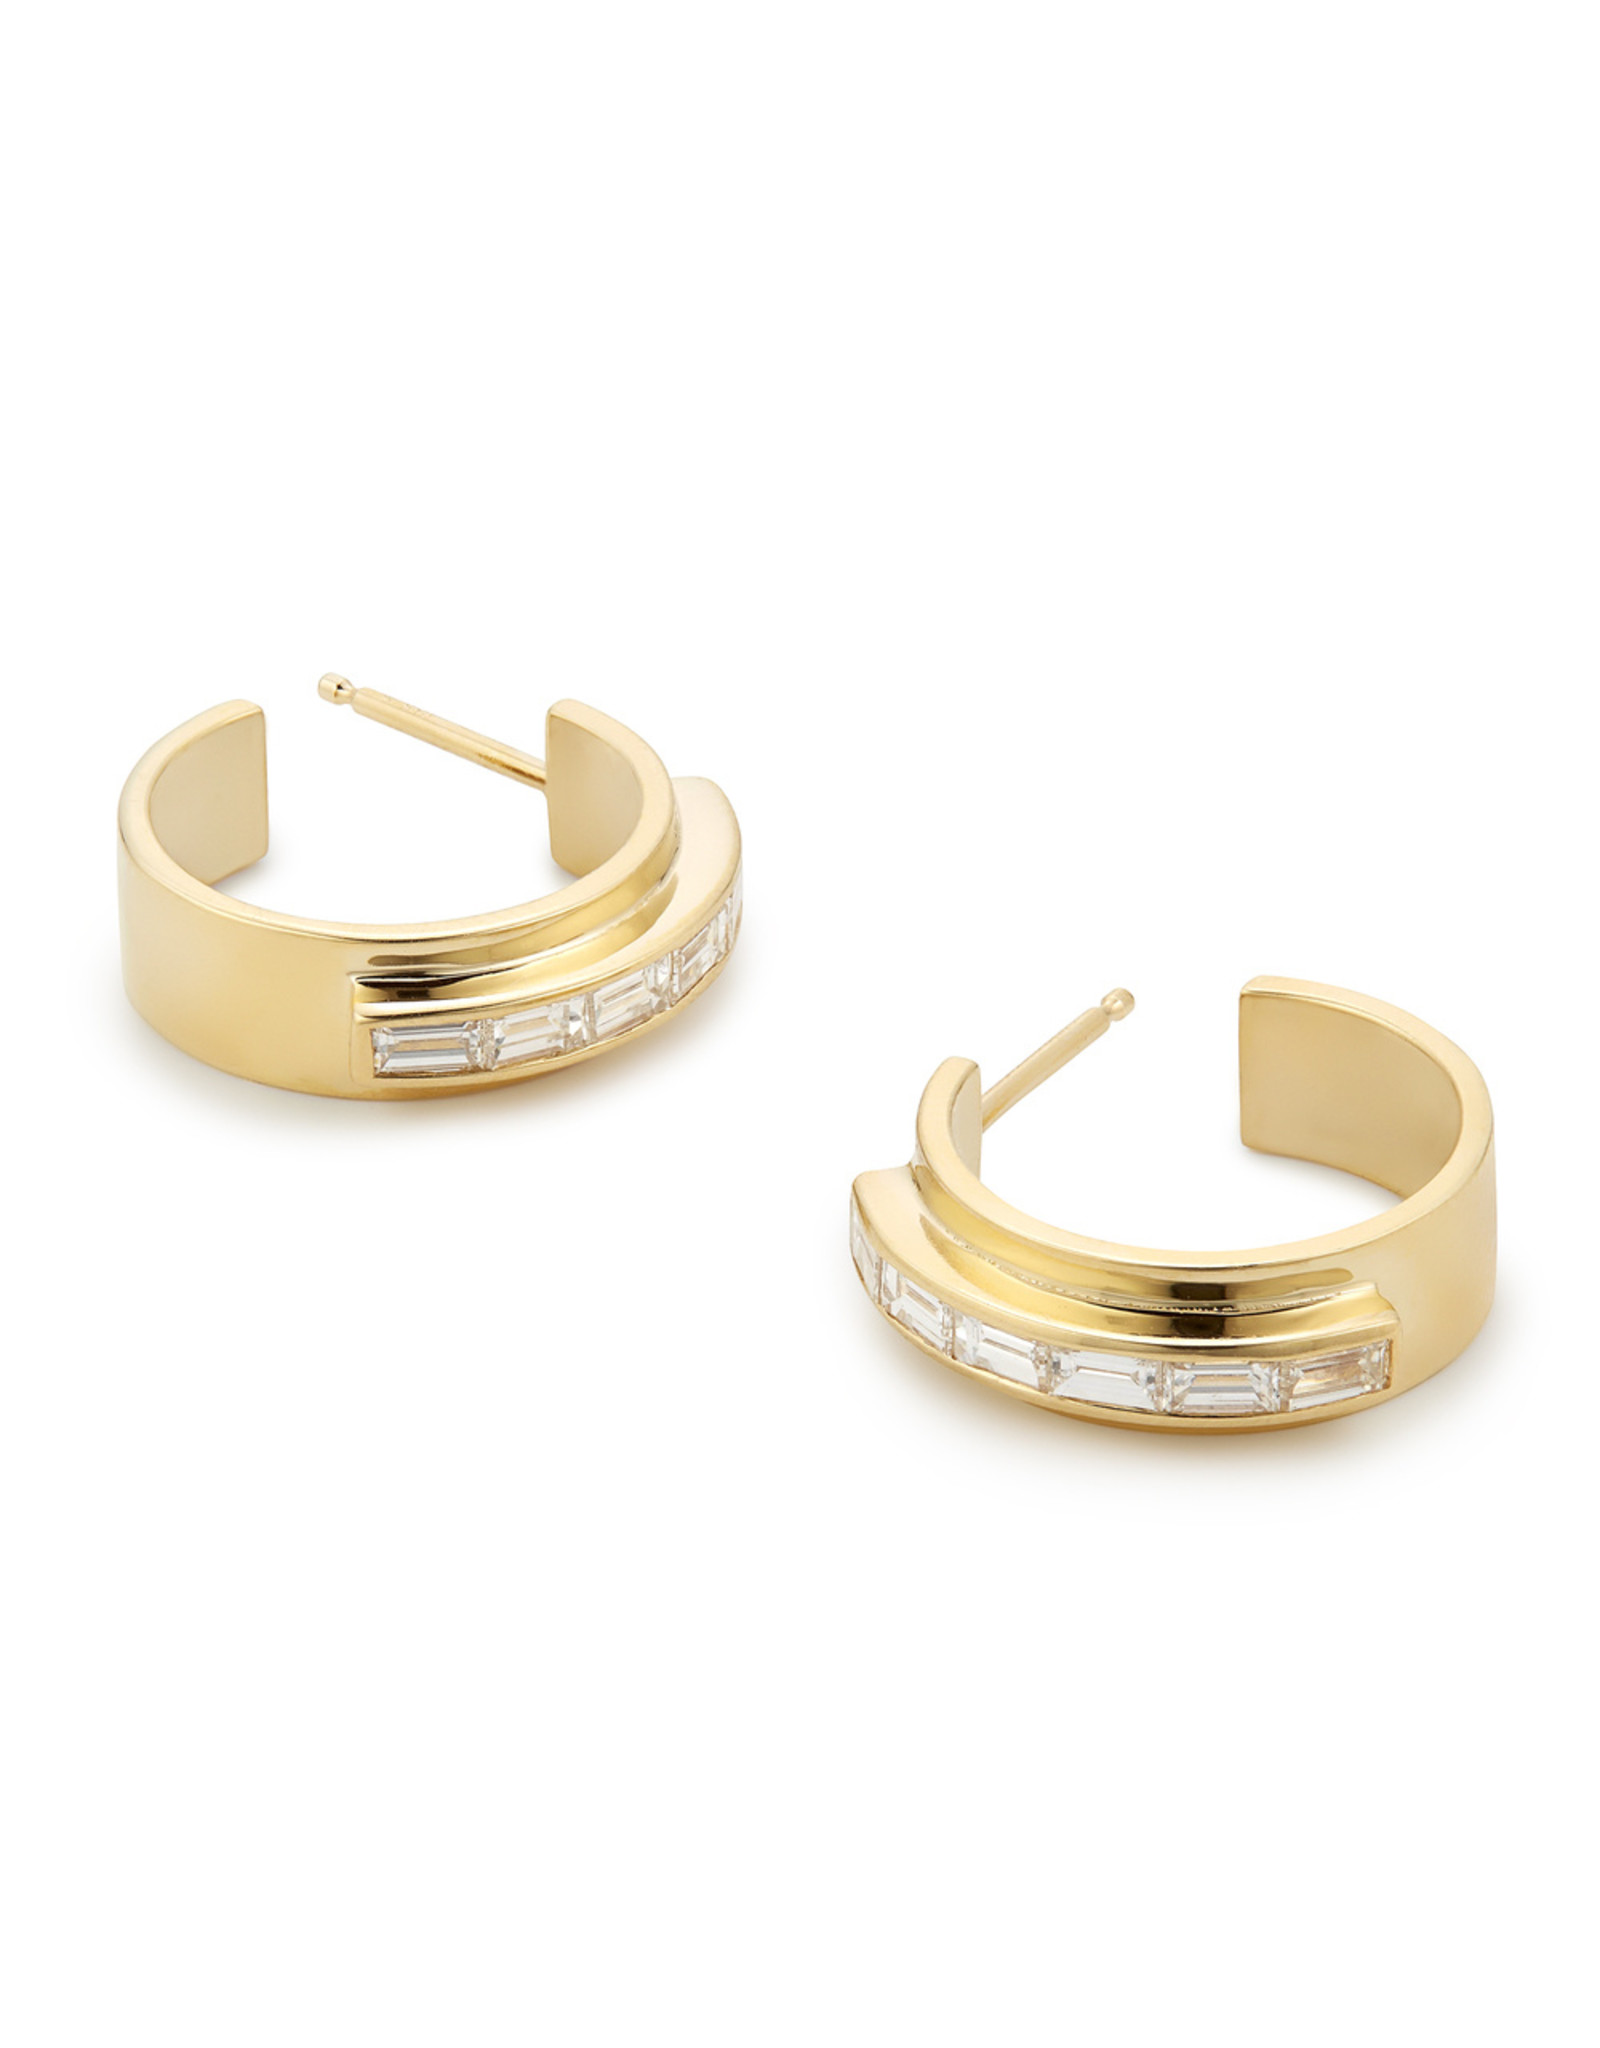 Azlee Azlee Twilight Baguette Diamond Hoops - Yellow Gold / White Diamond